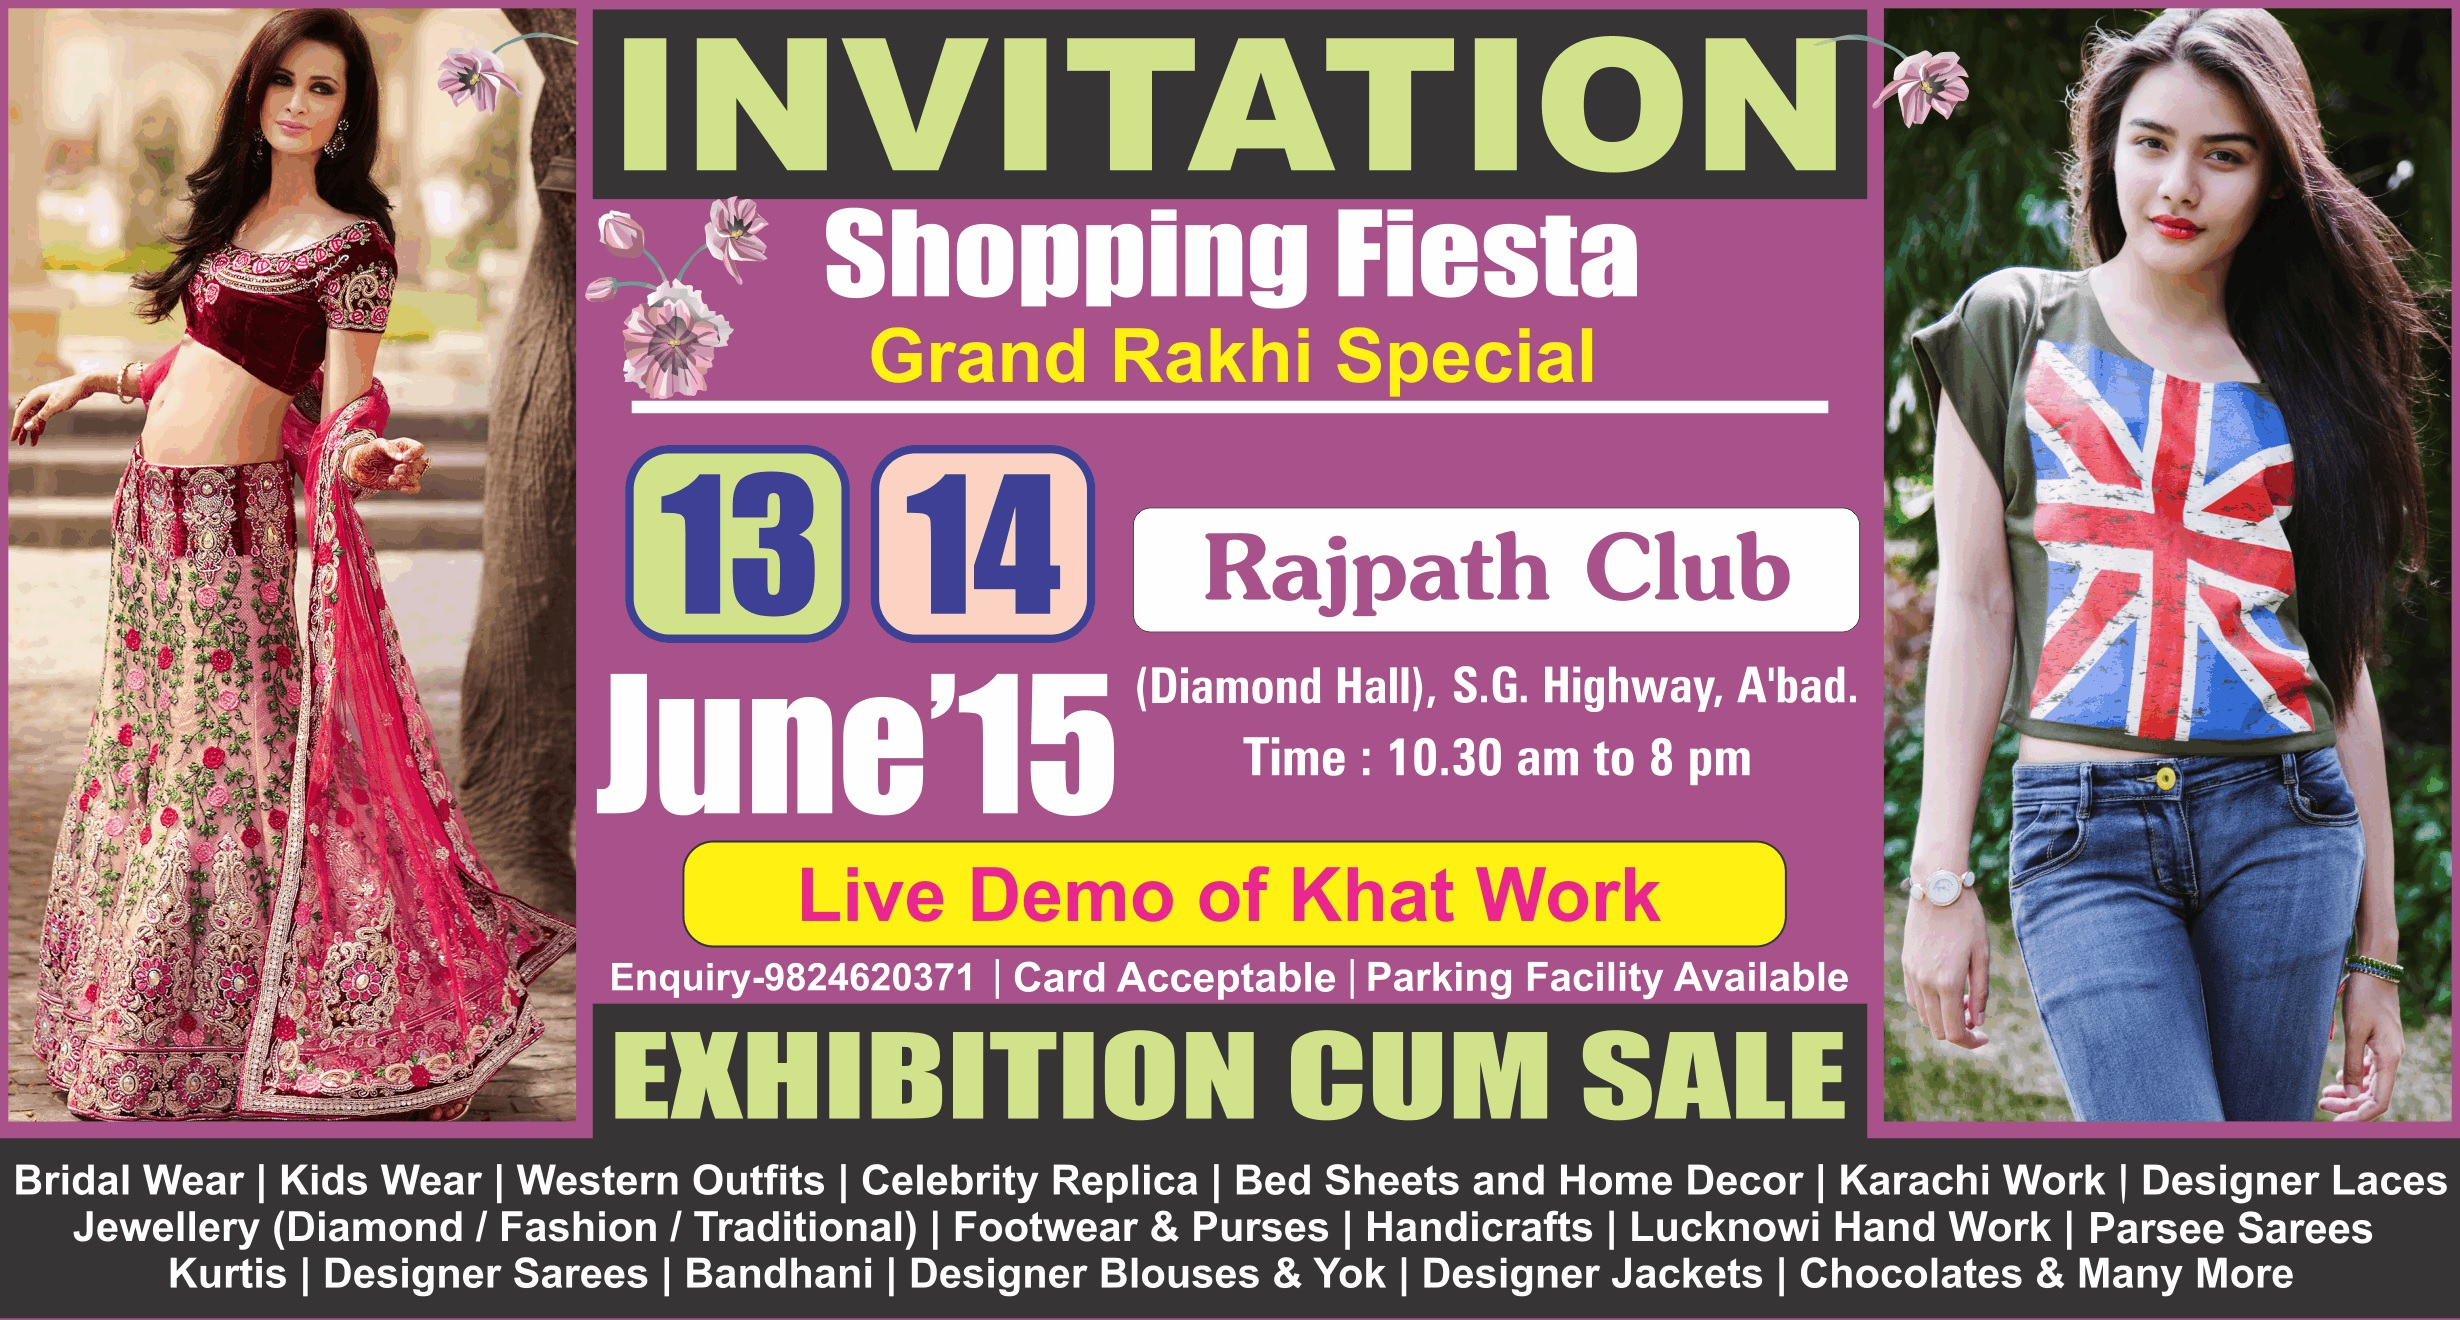 The Shopping Fiesta exhibition